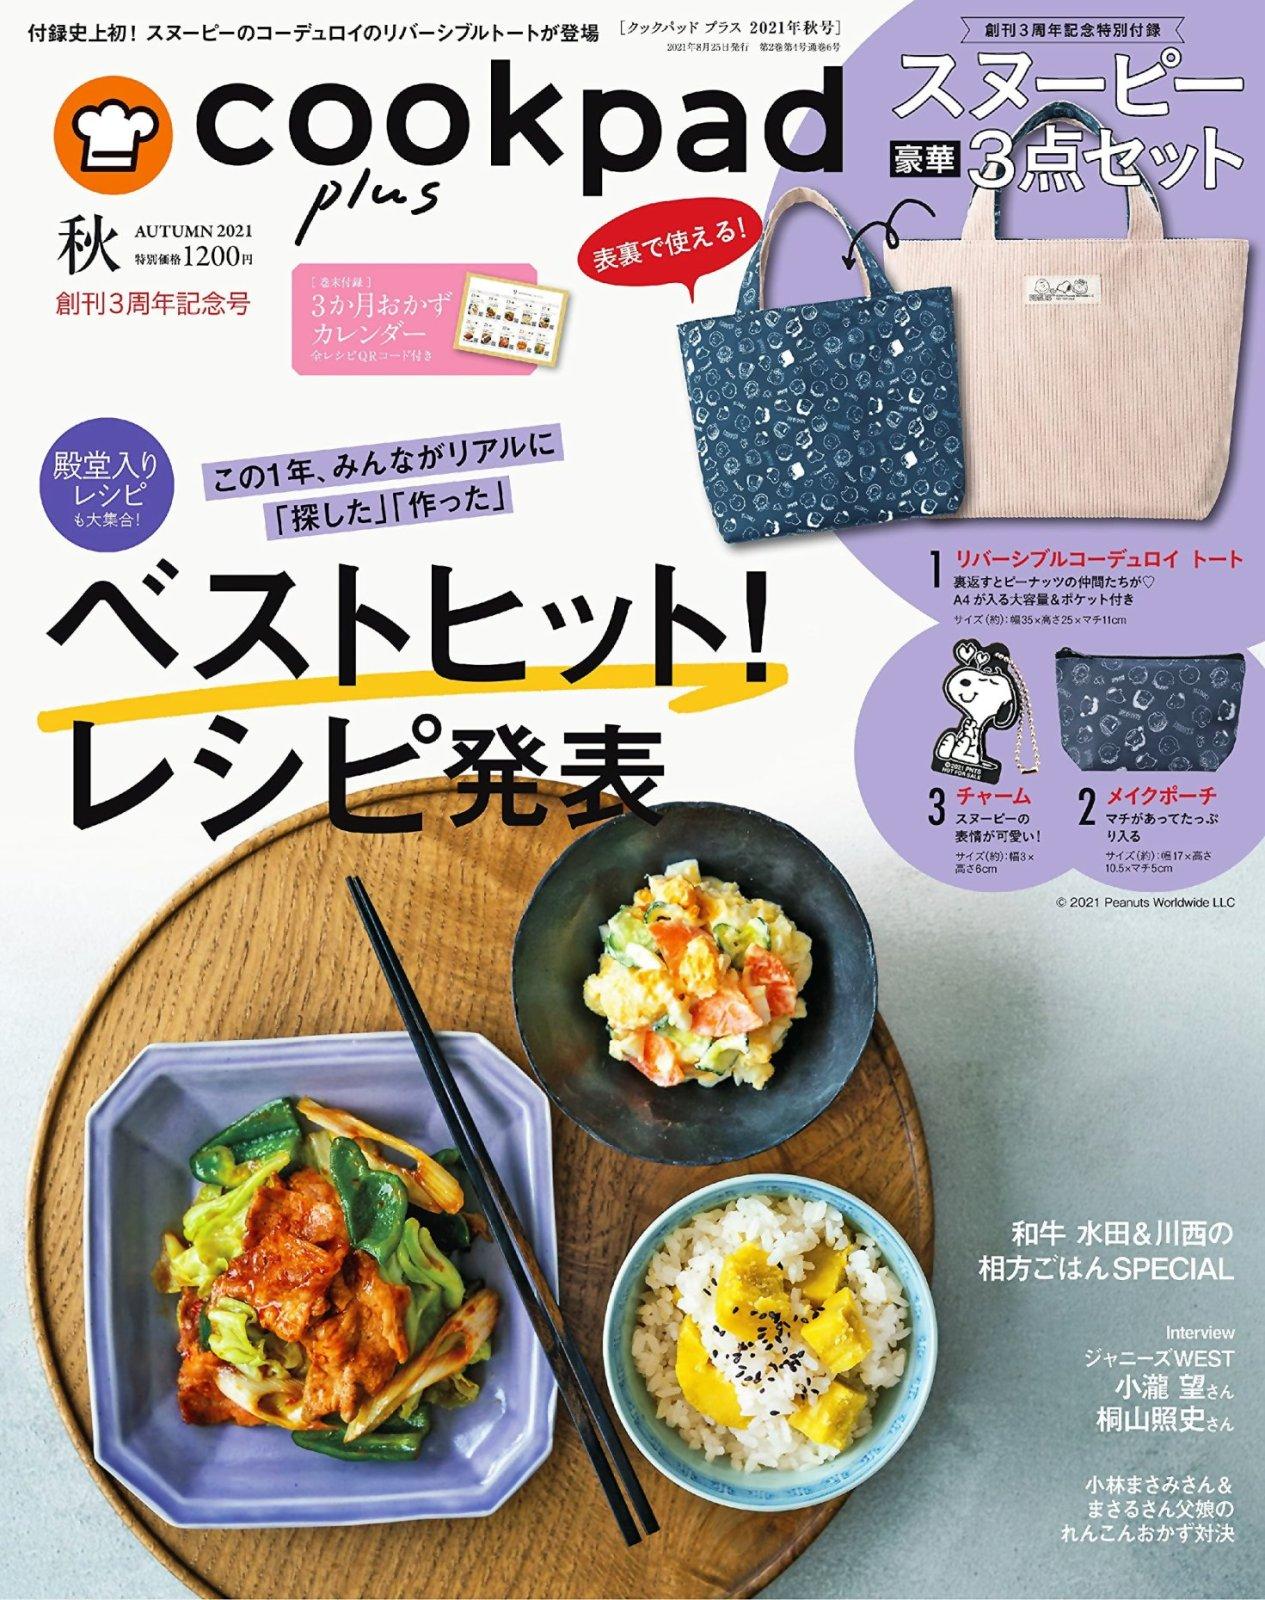 cookpad plus 10月號/2021(航空版)